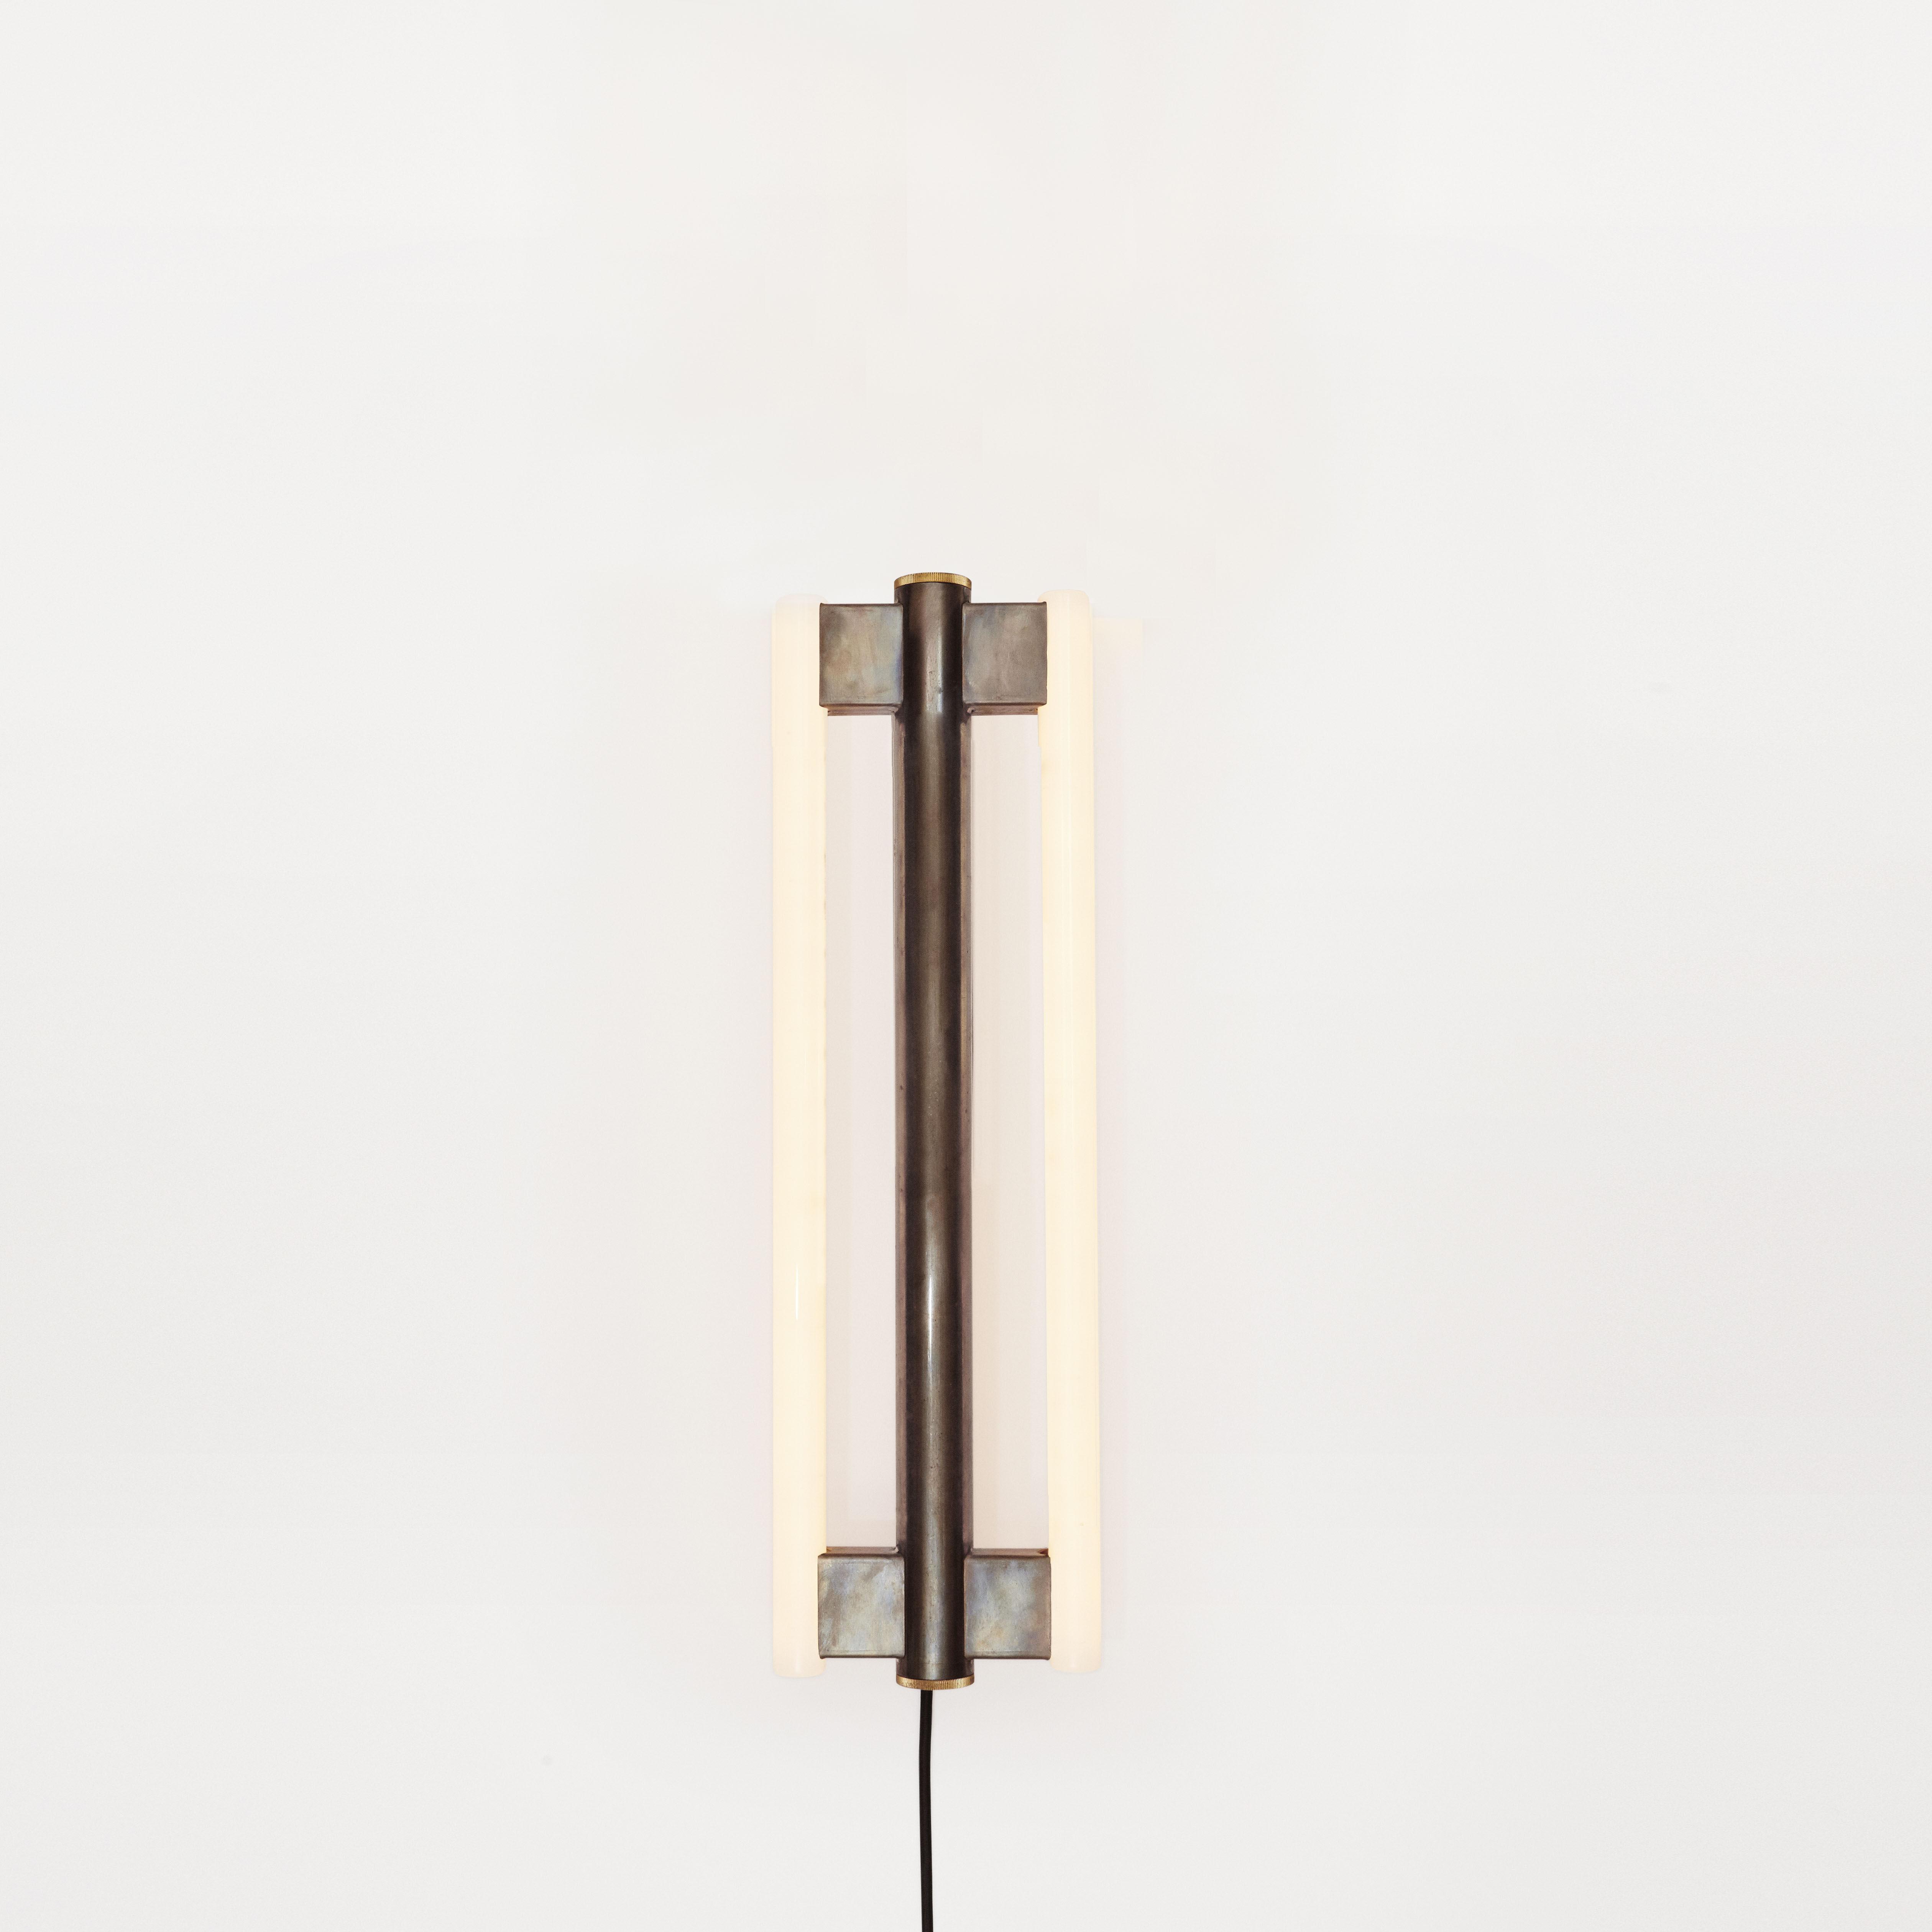 Lighting - Wall Lights - Eiffel Wall light with plug - / H 50 cm by Frama  - h 50 cm / Antique steel - Acier brut ciré, Opal Glass